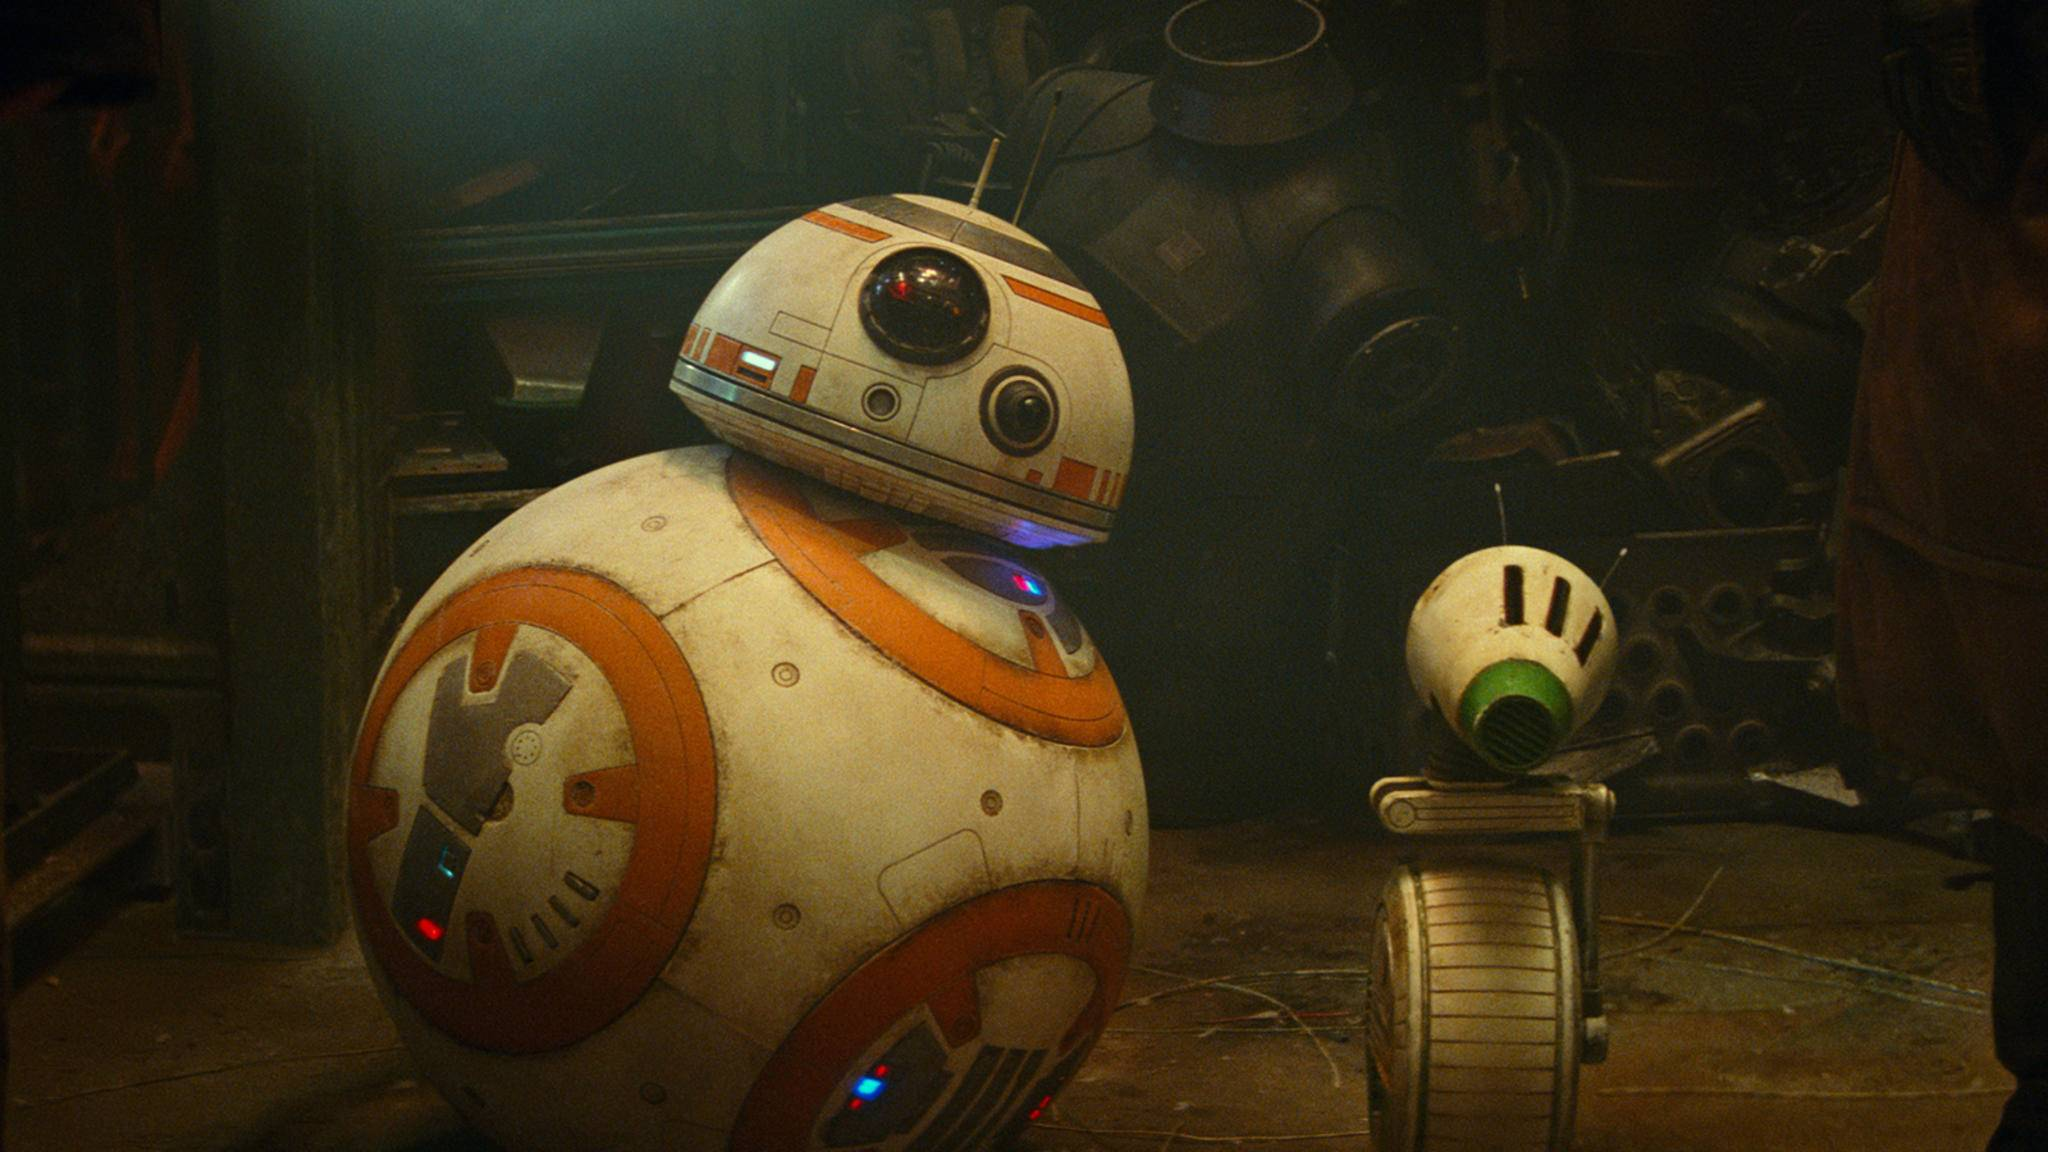 Star Wars Aufstieg Skywalkers BB-8 D-O